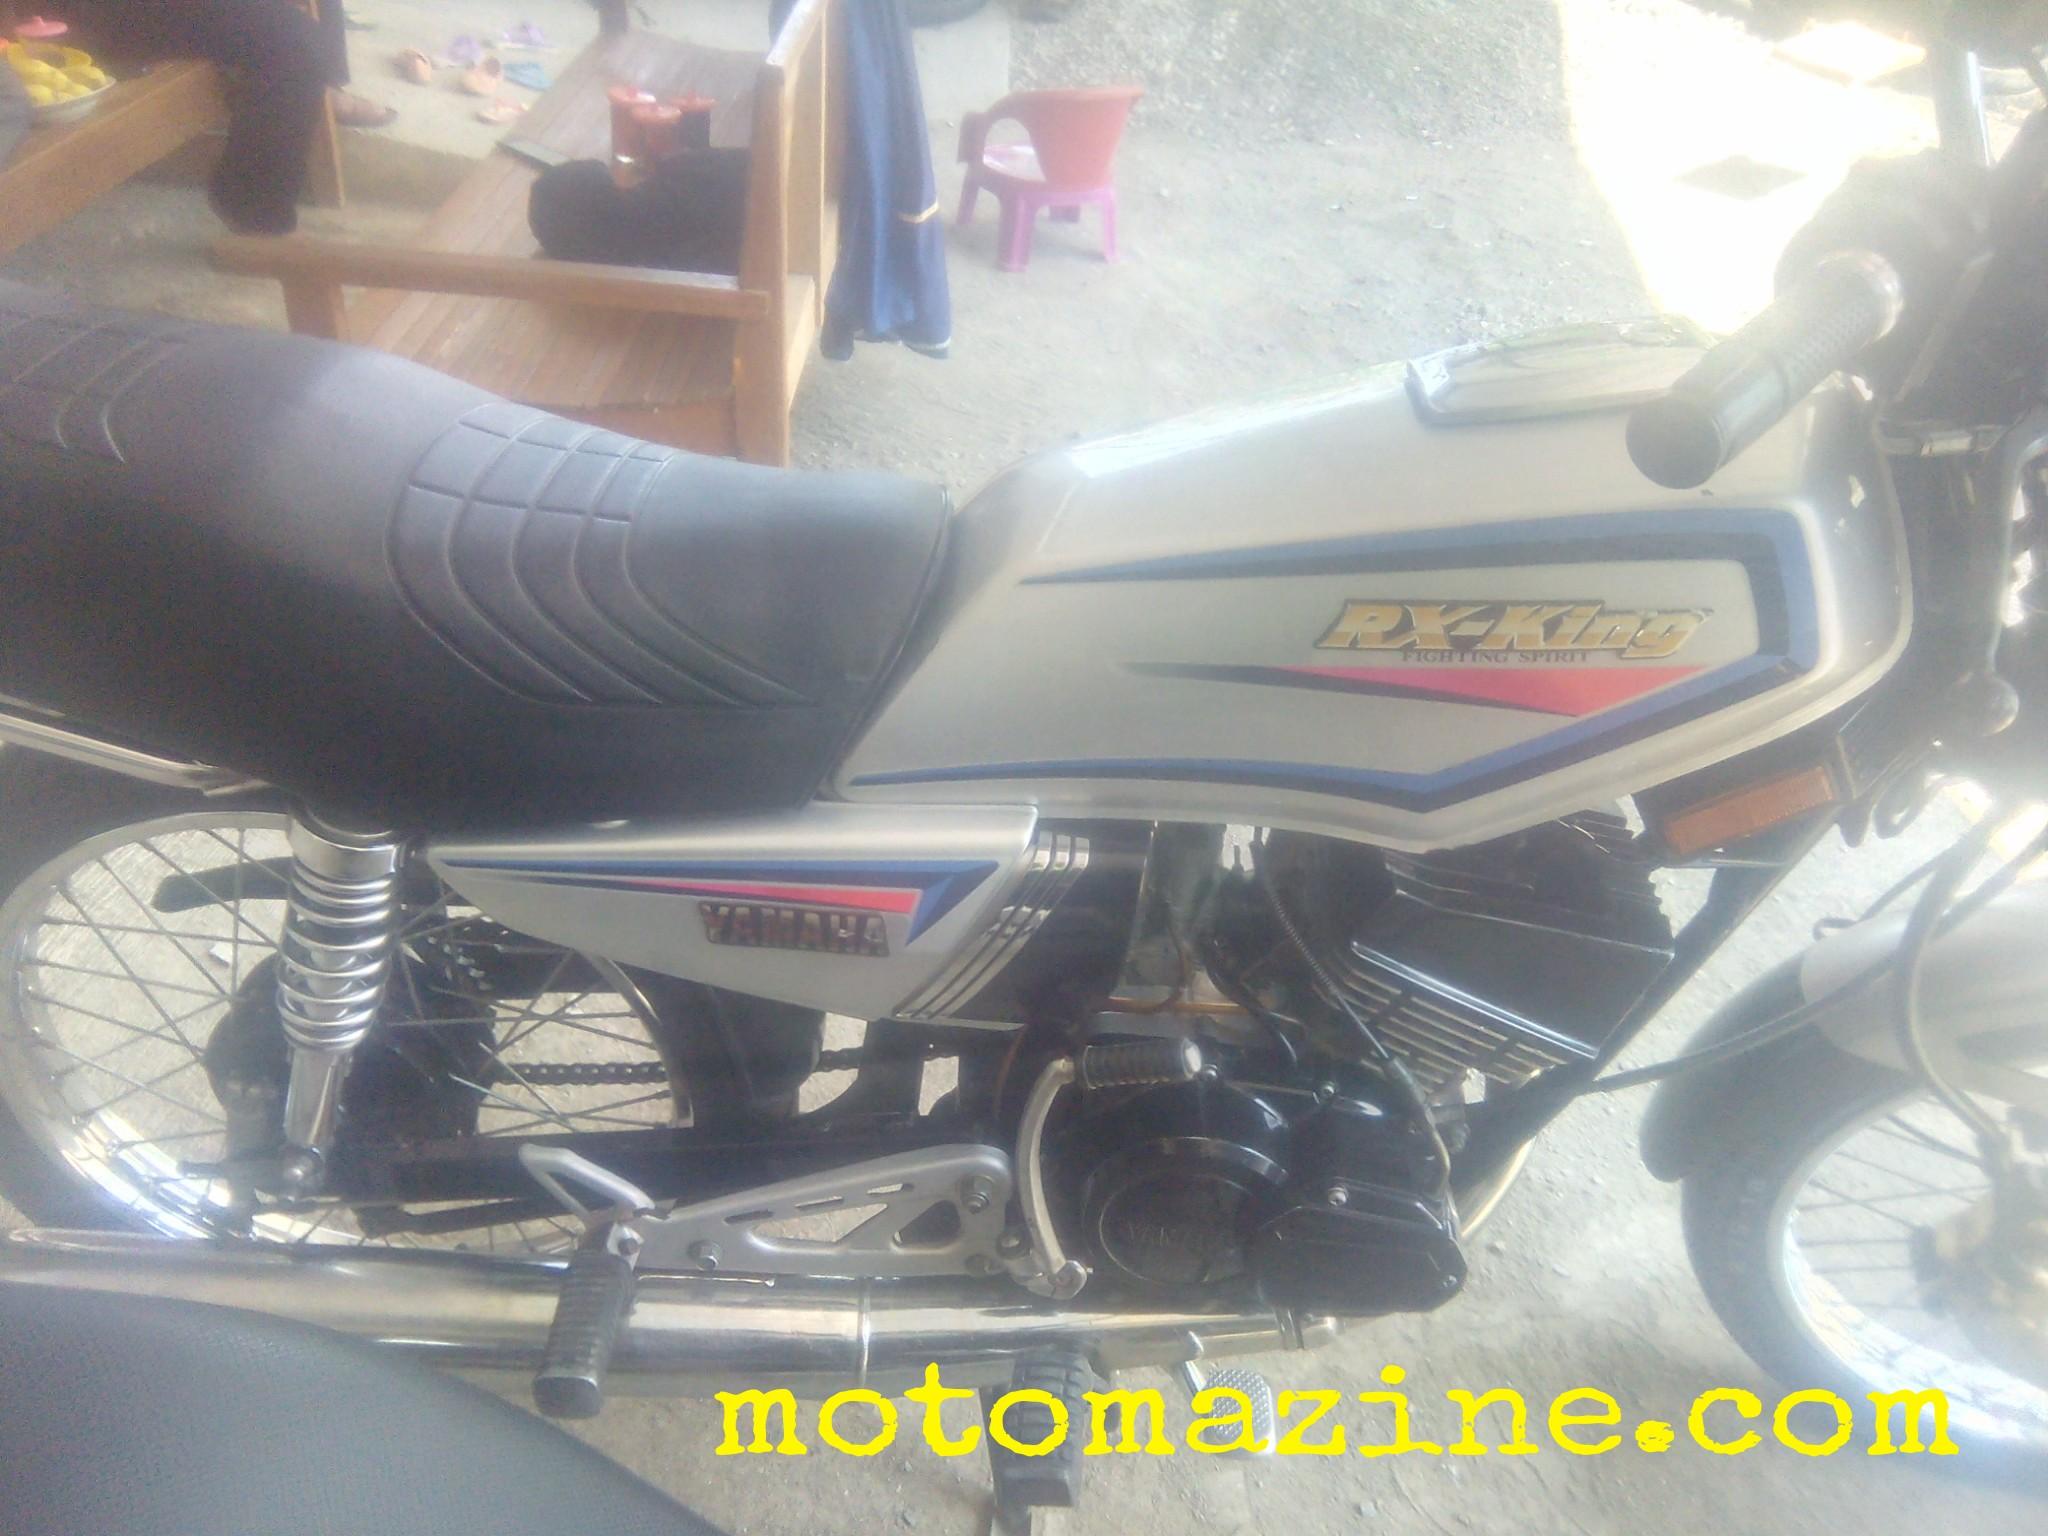 Harga Yamaha RX King Di Ponorogo Bakal Bikin Anda Menelan Ludah